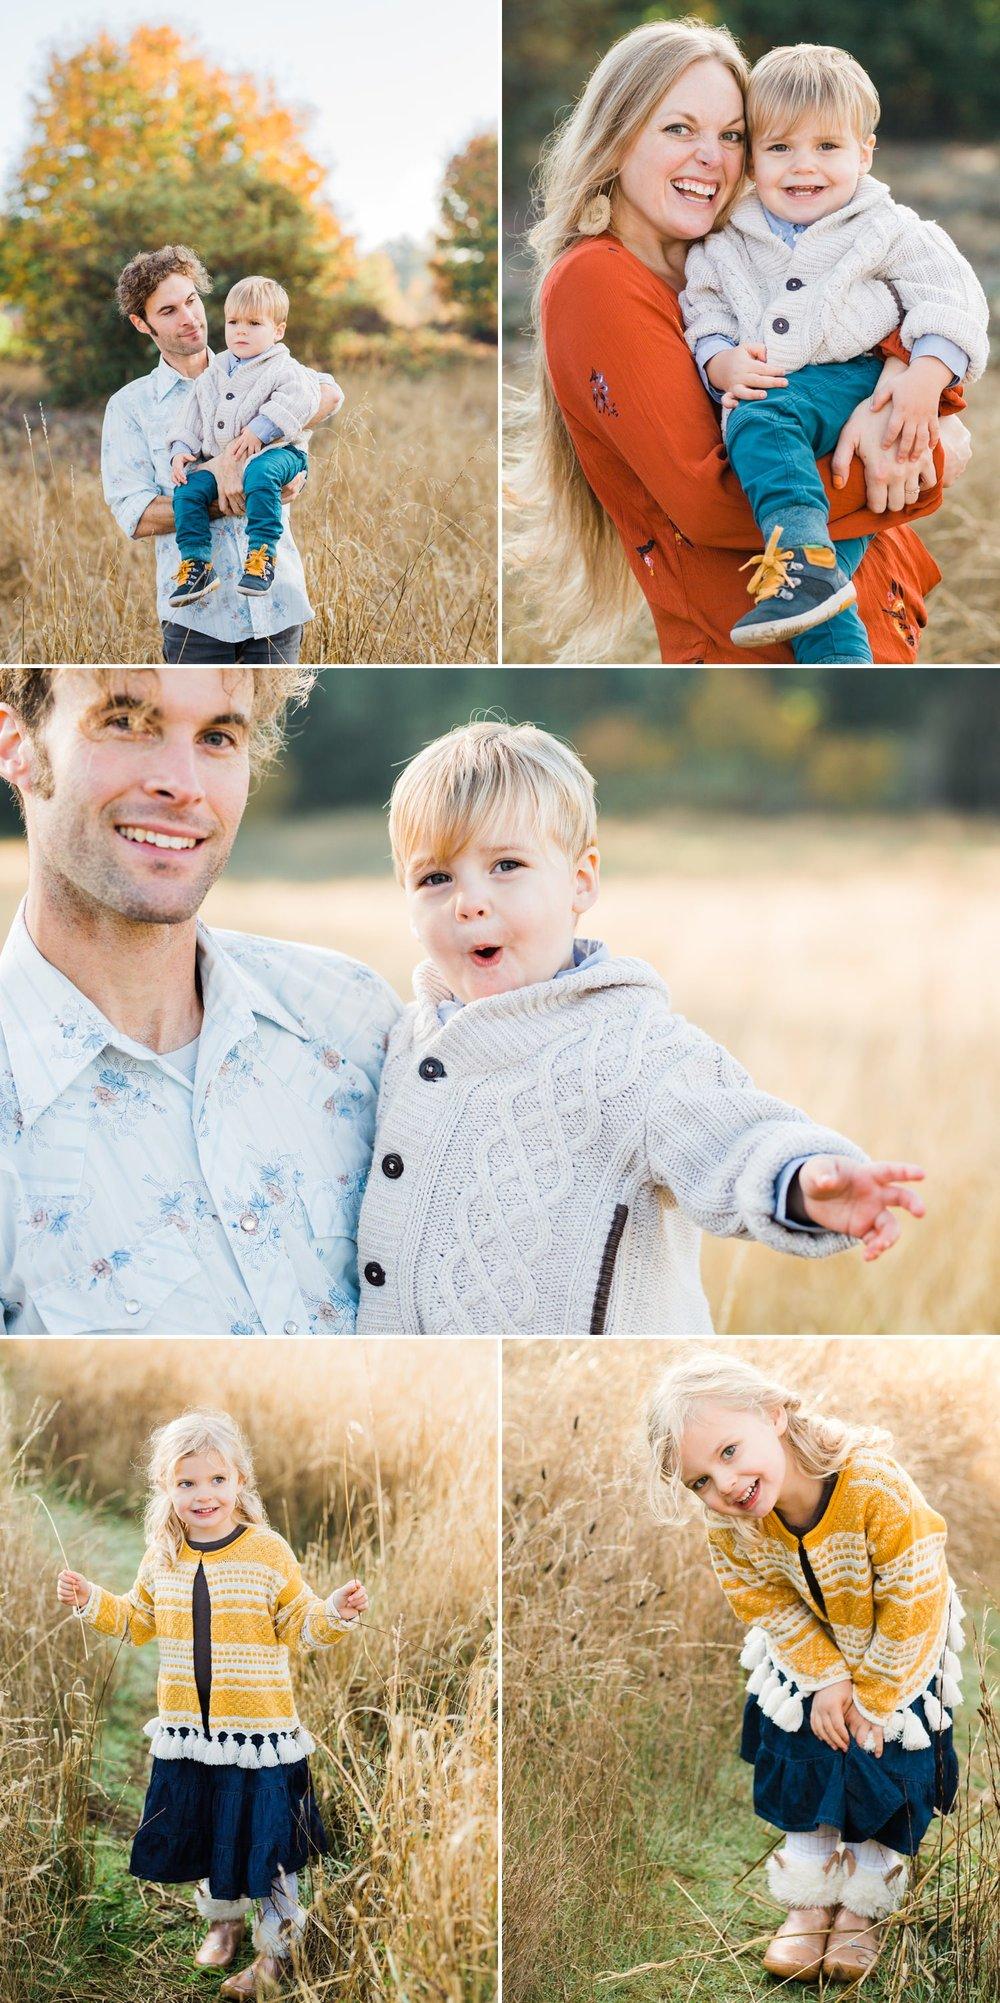 4-lifestyle-children-photographer-seattle.jpg